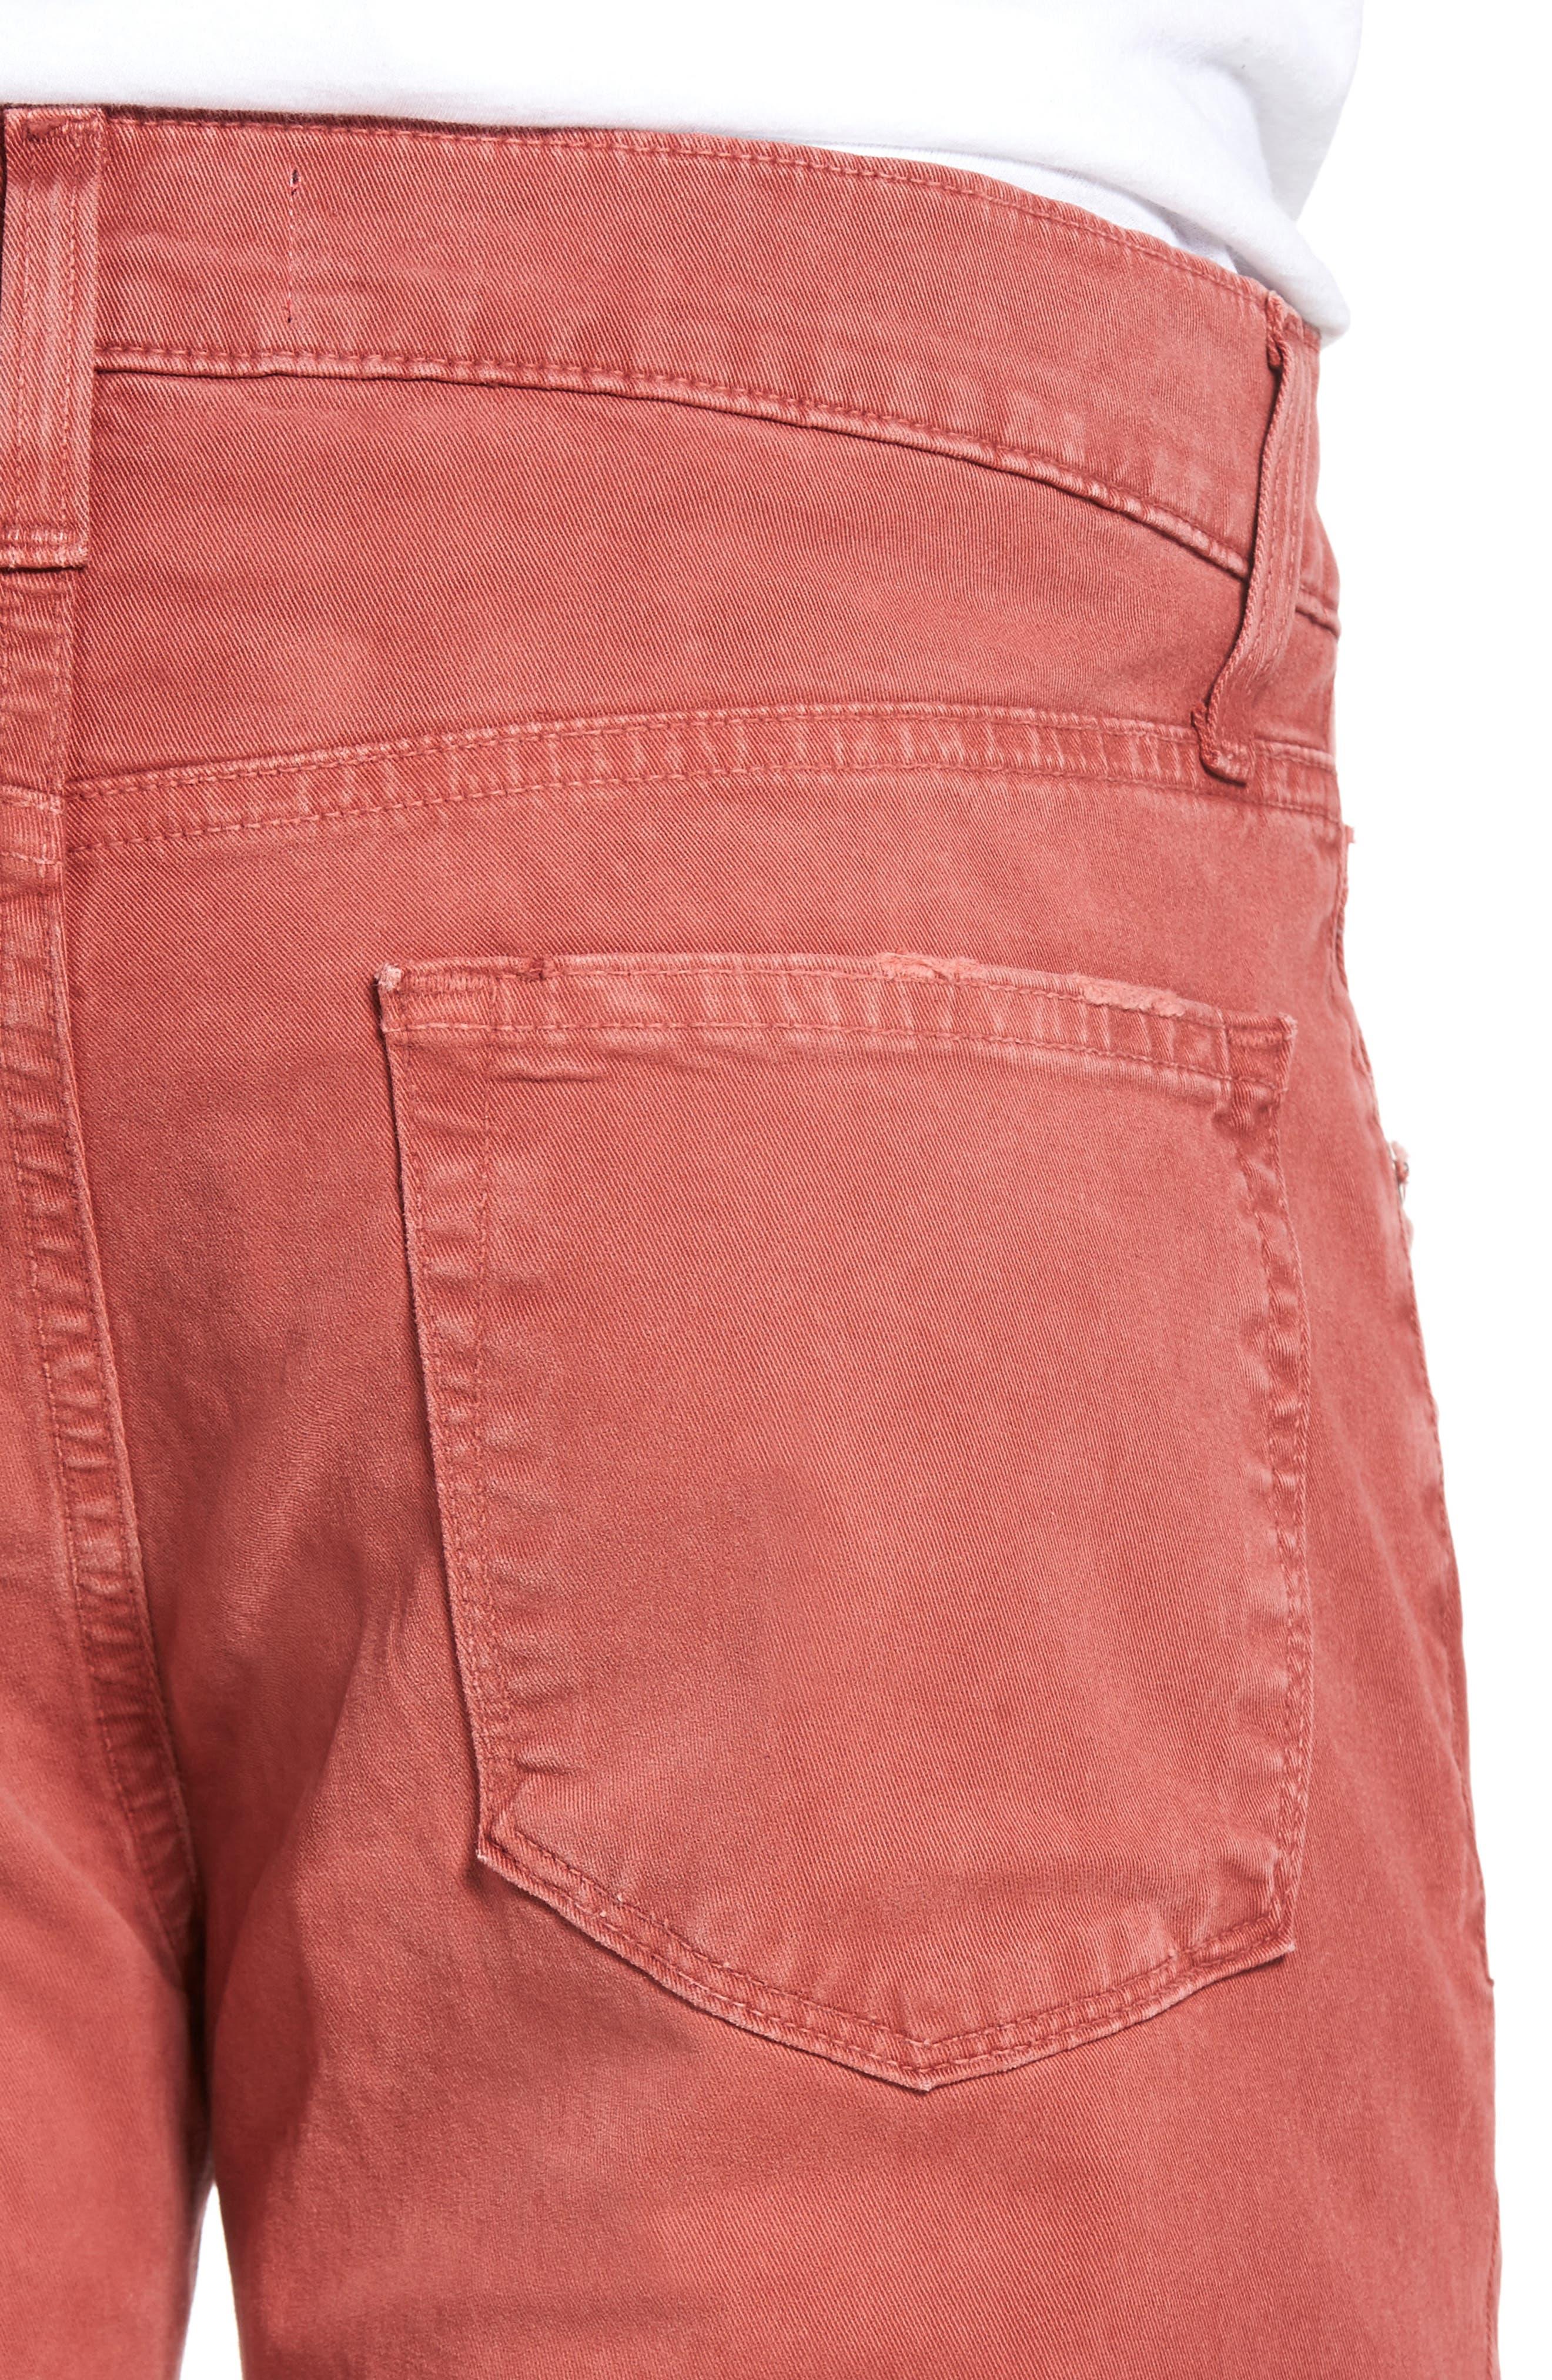 Tyler Slim Fit Jeans,                             Alternate thumbnail 24, color,